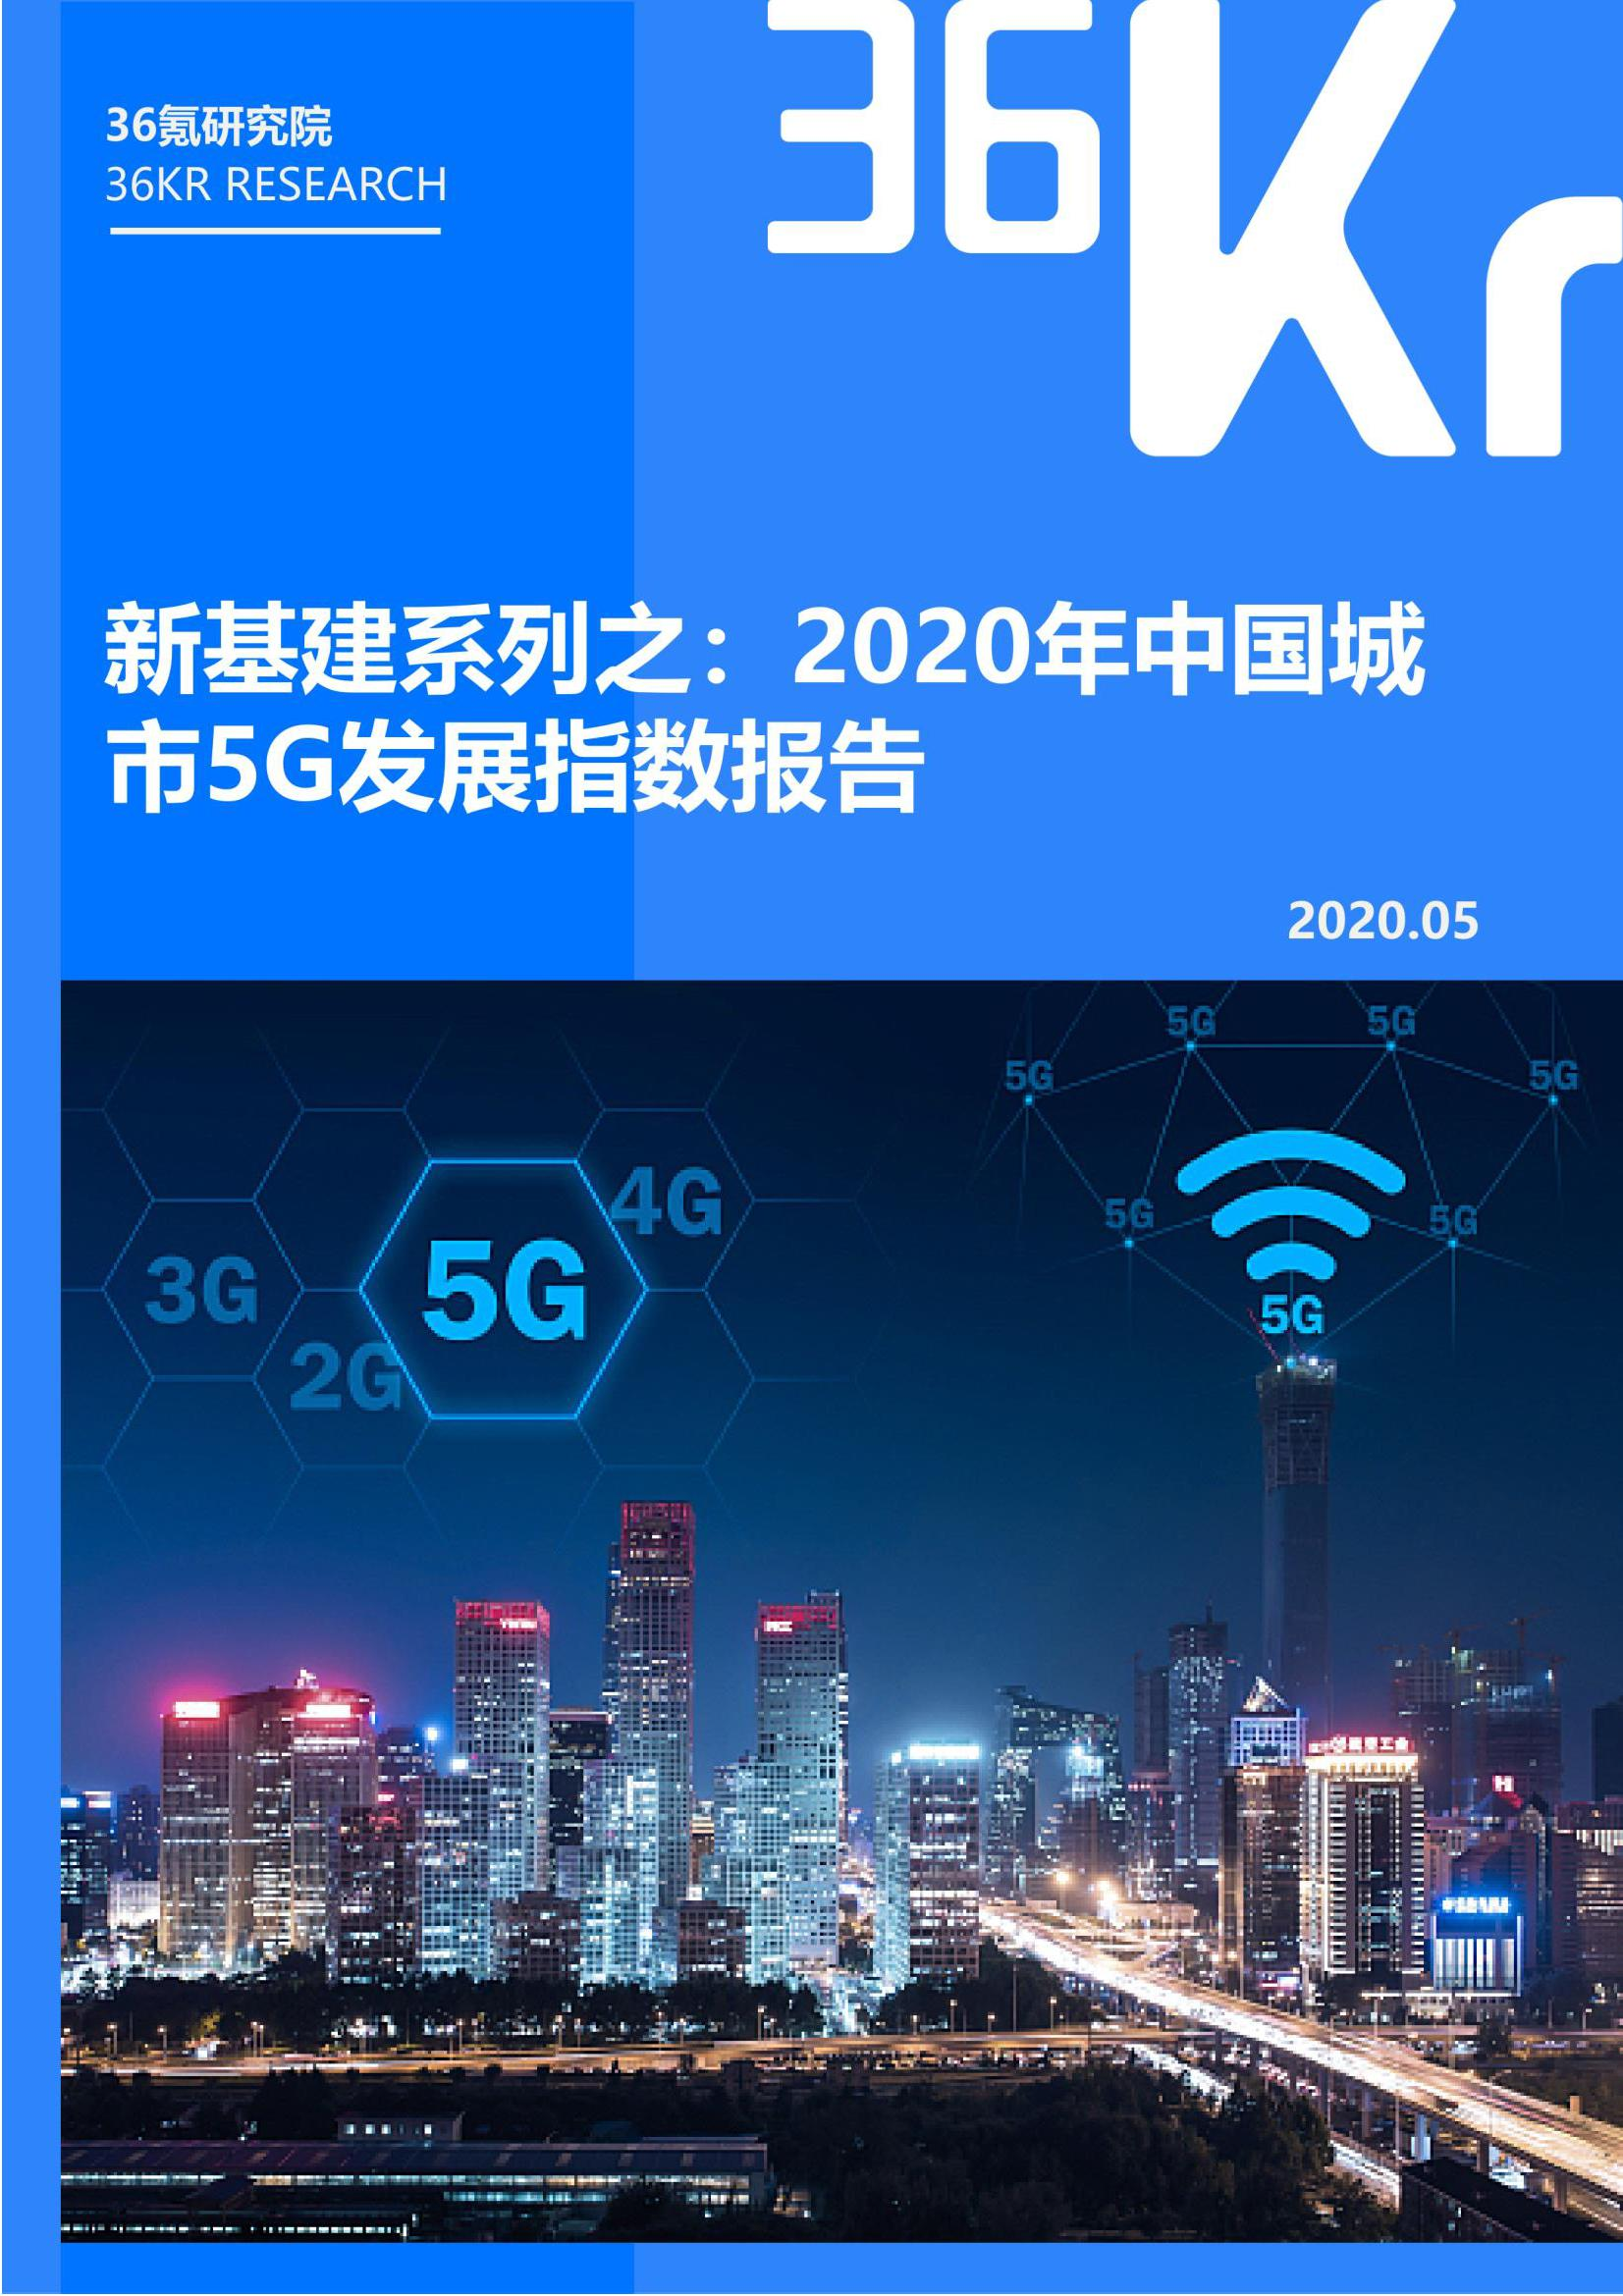 36kr:2020年中国城市5G发展指数报告(附下载)